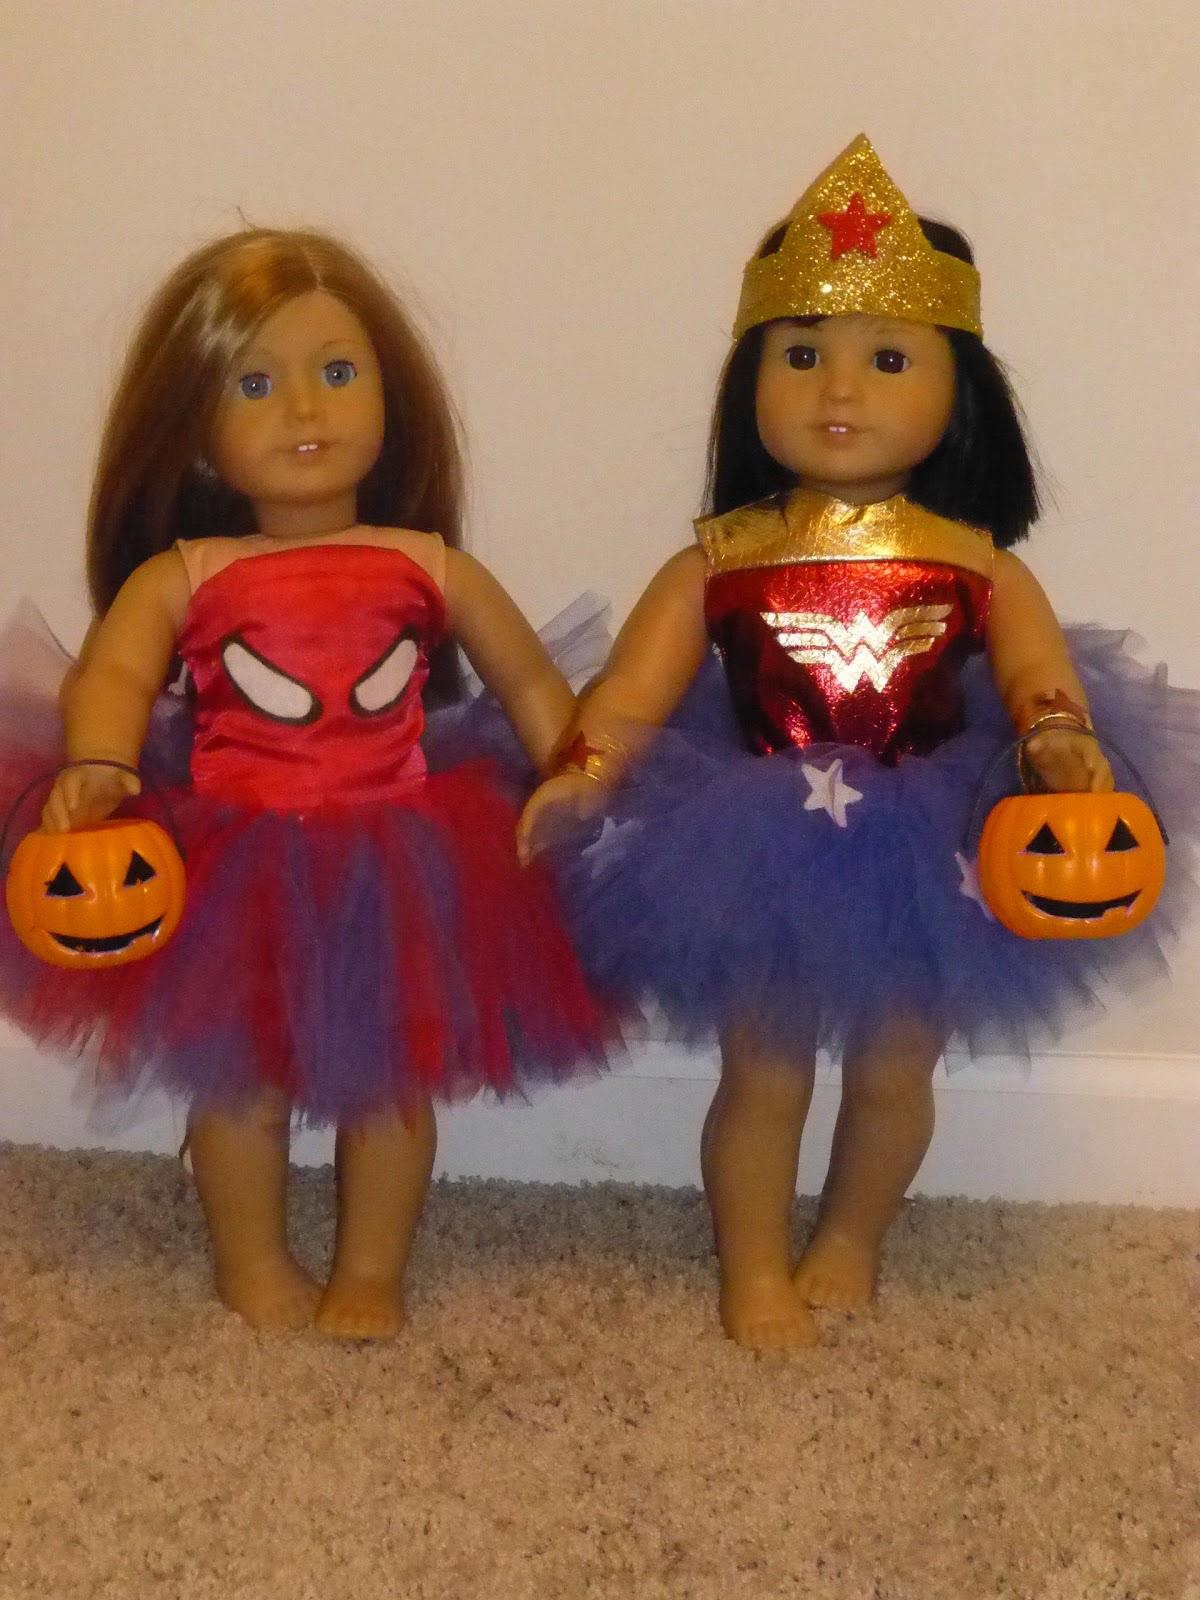 theresa u0026 39 s mixed nuts  american girl superheros